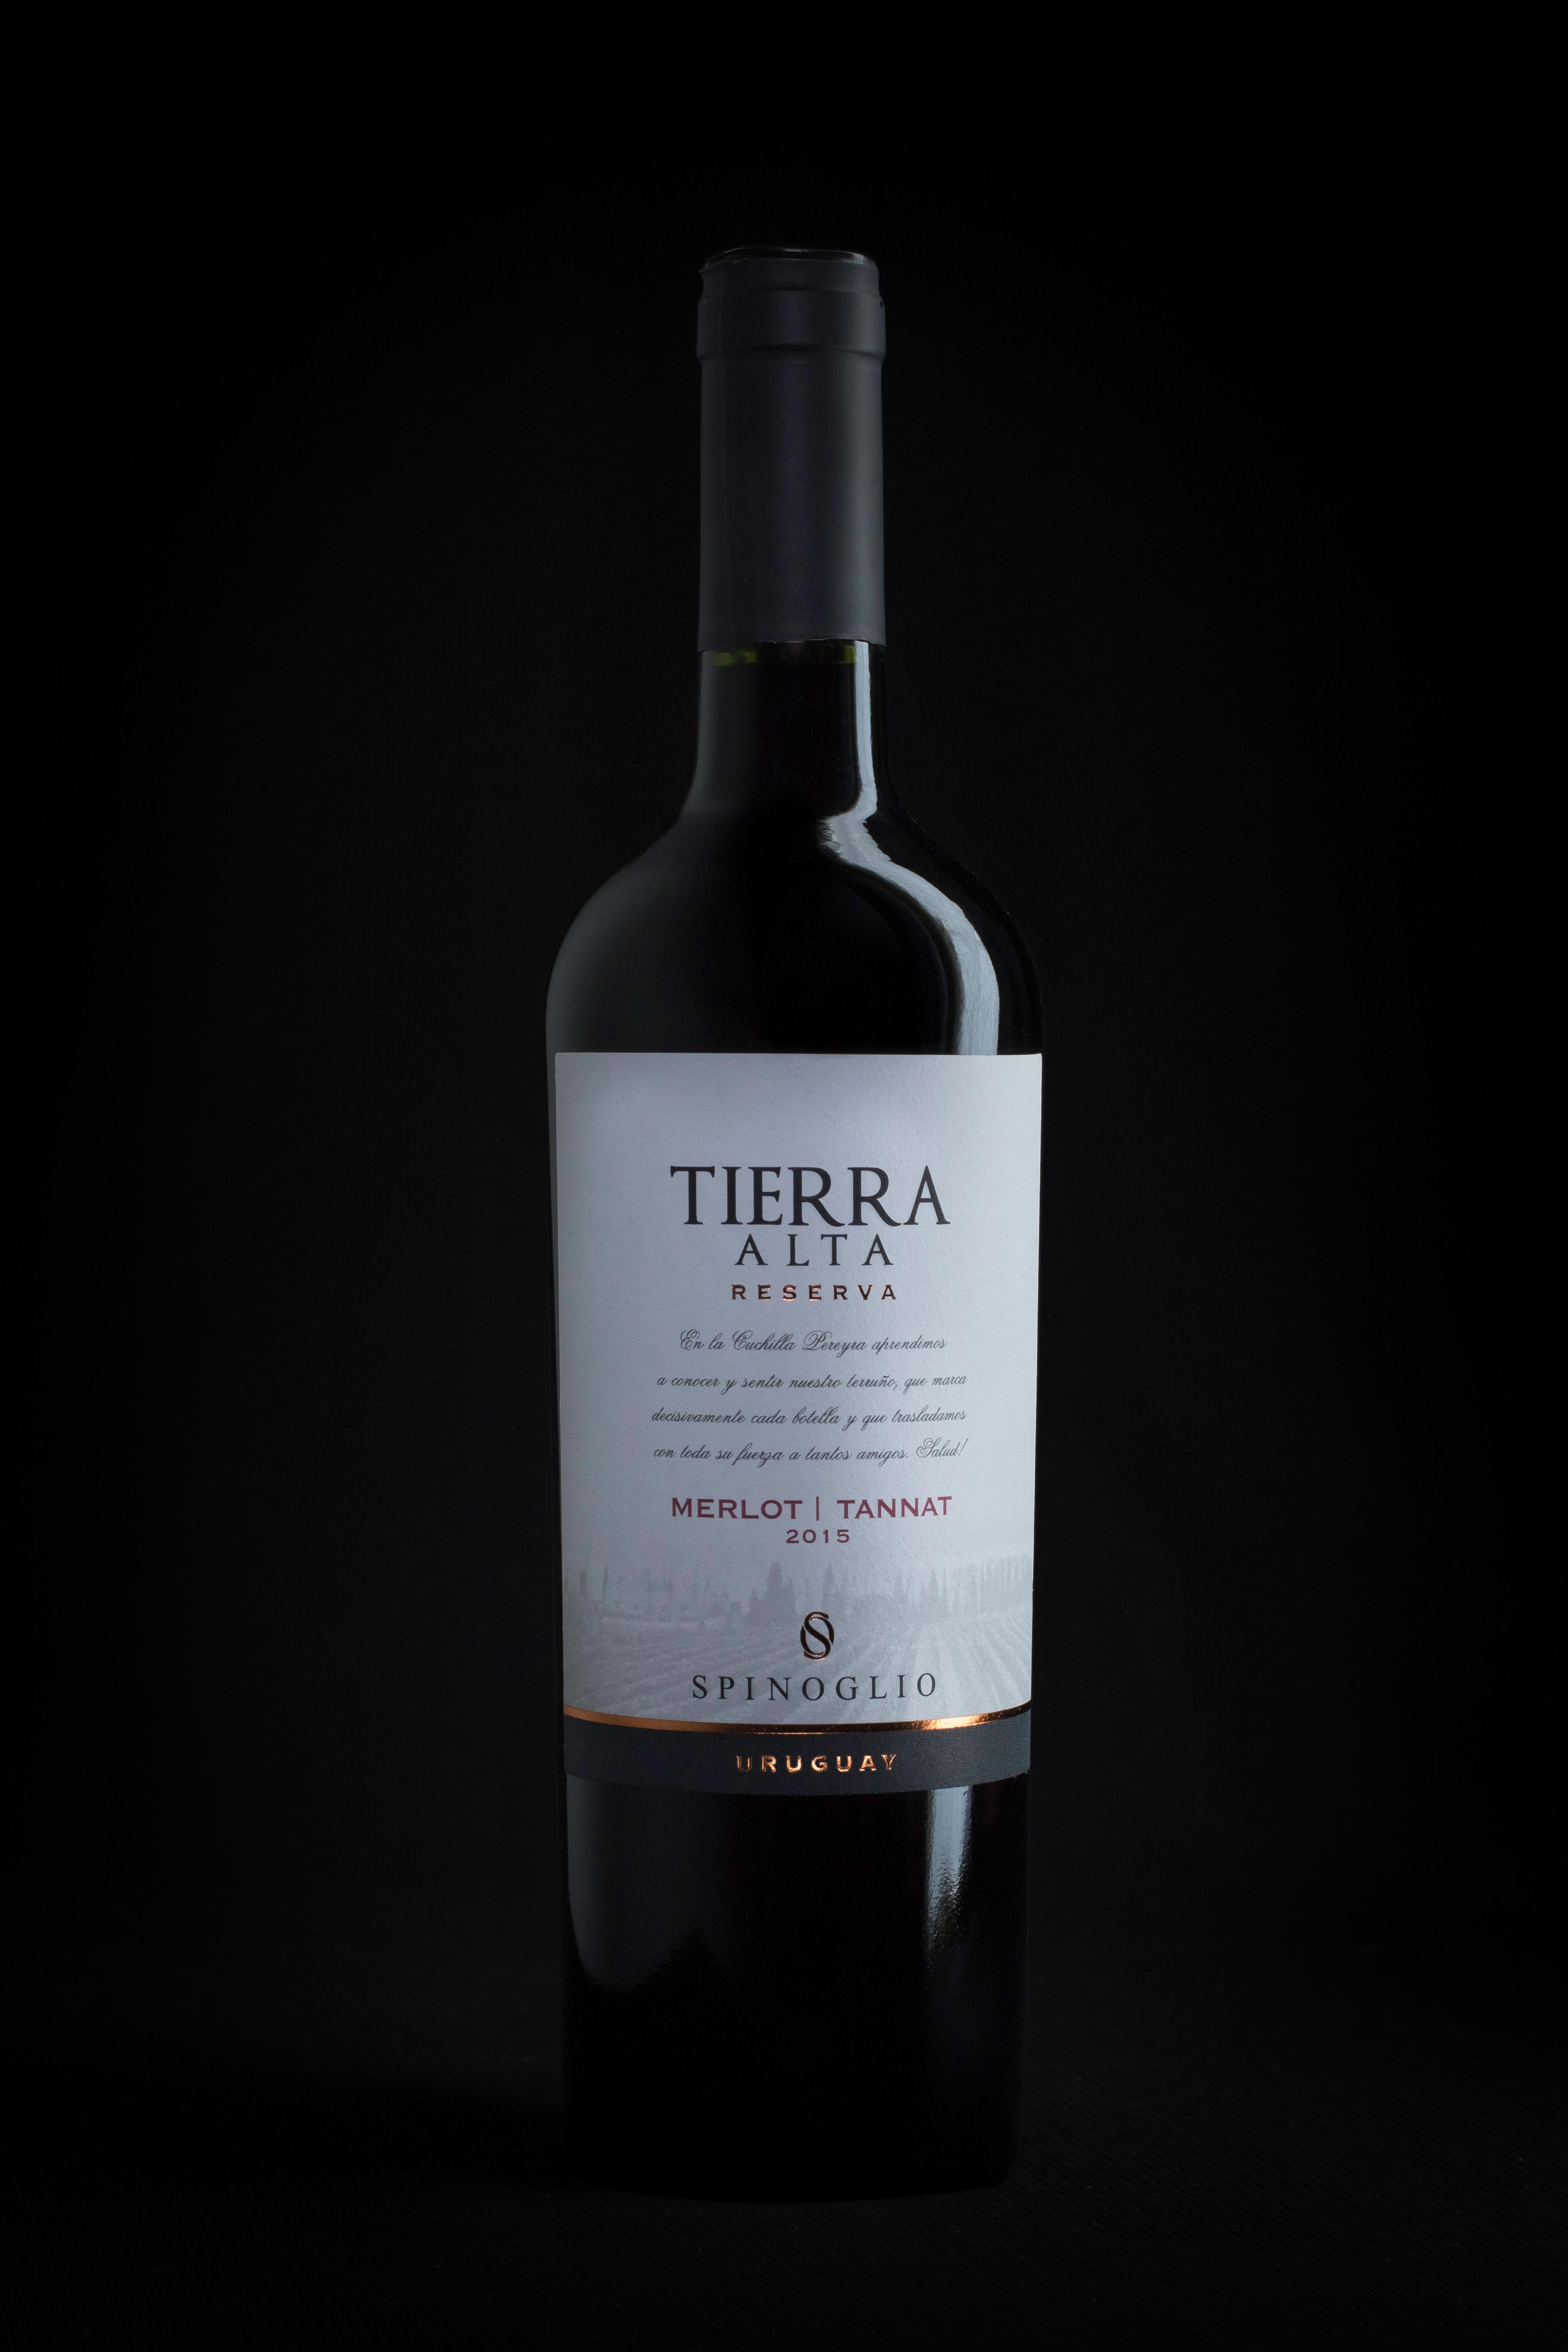 5 TIERRA ALTA RESERVA MERLOT TANNAT 2015